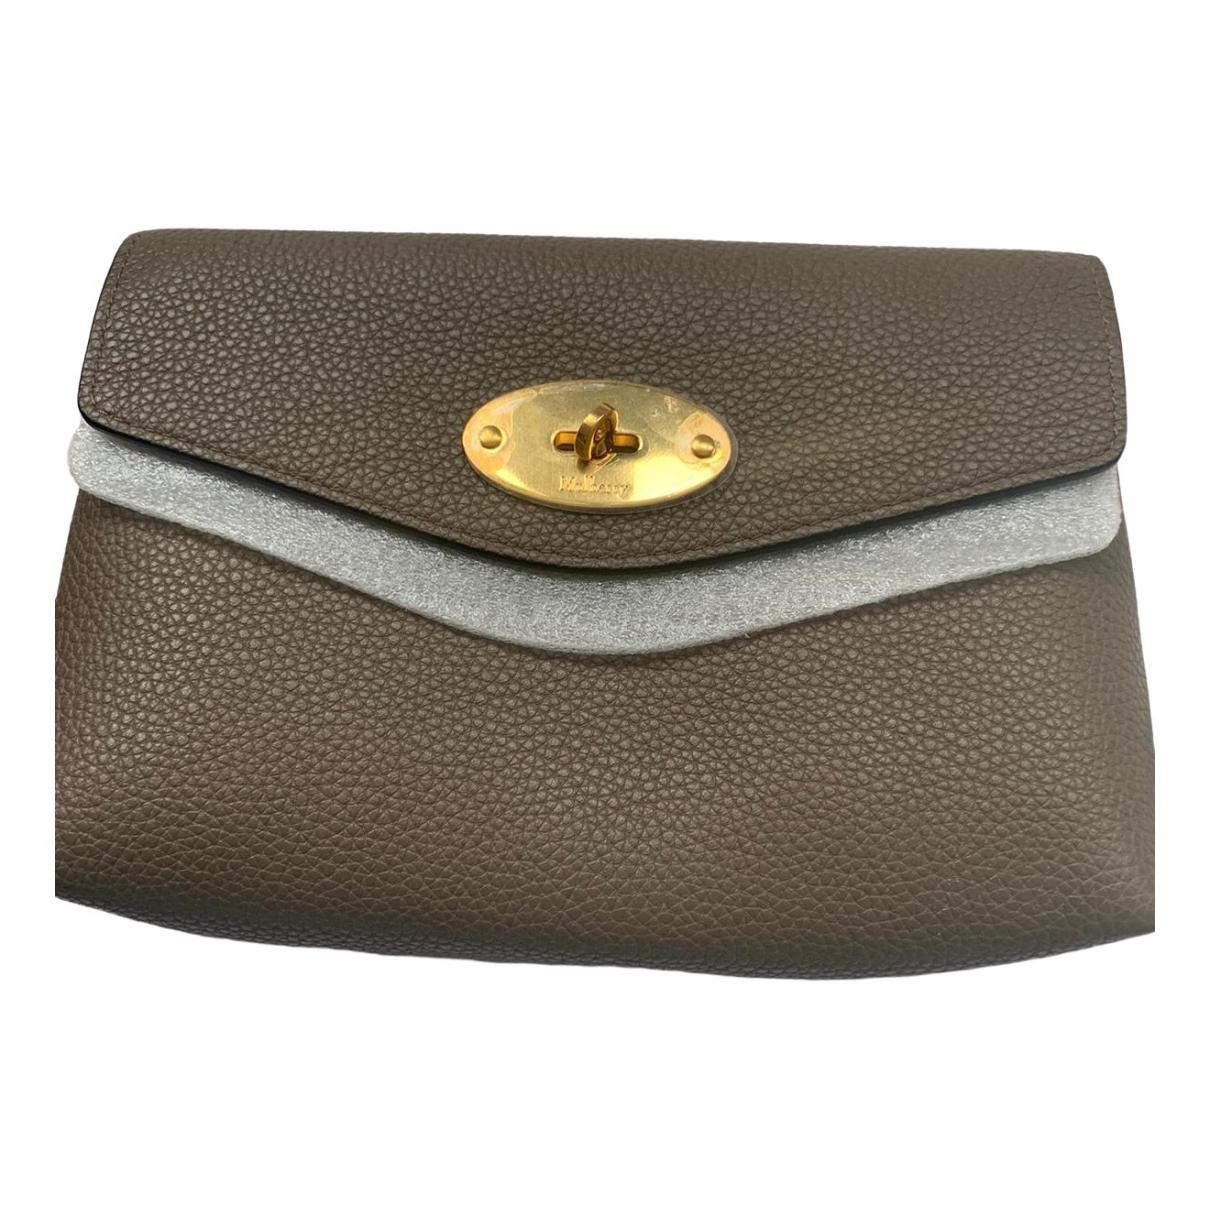 Mulberry \N Grey Leather Clutch bag for Women \N